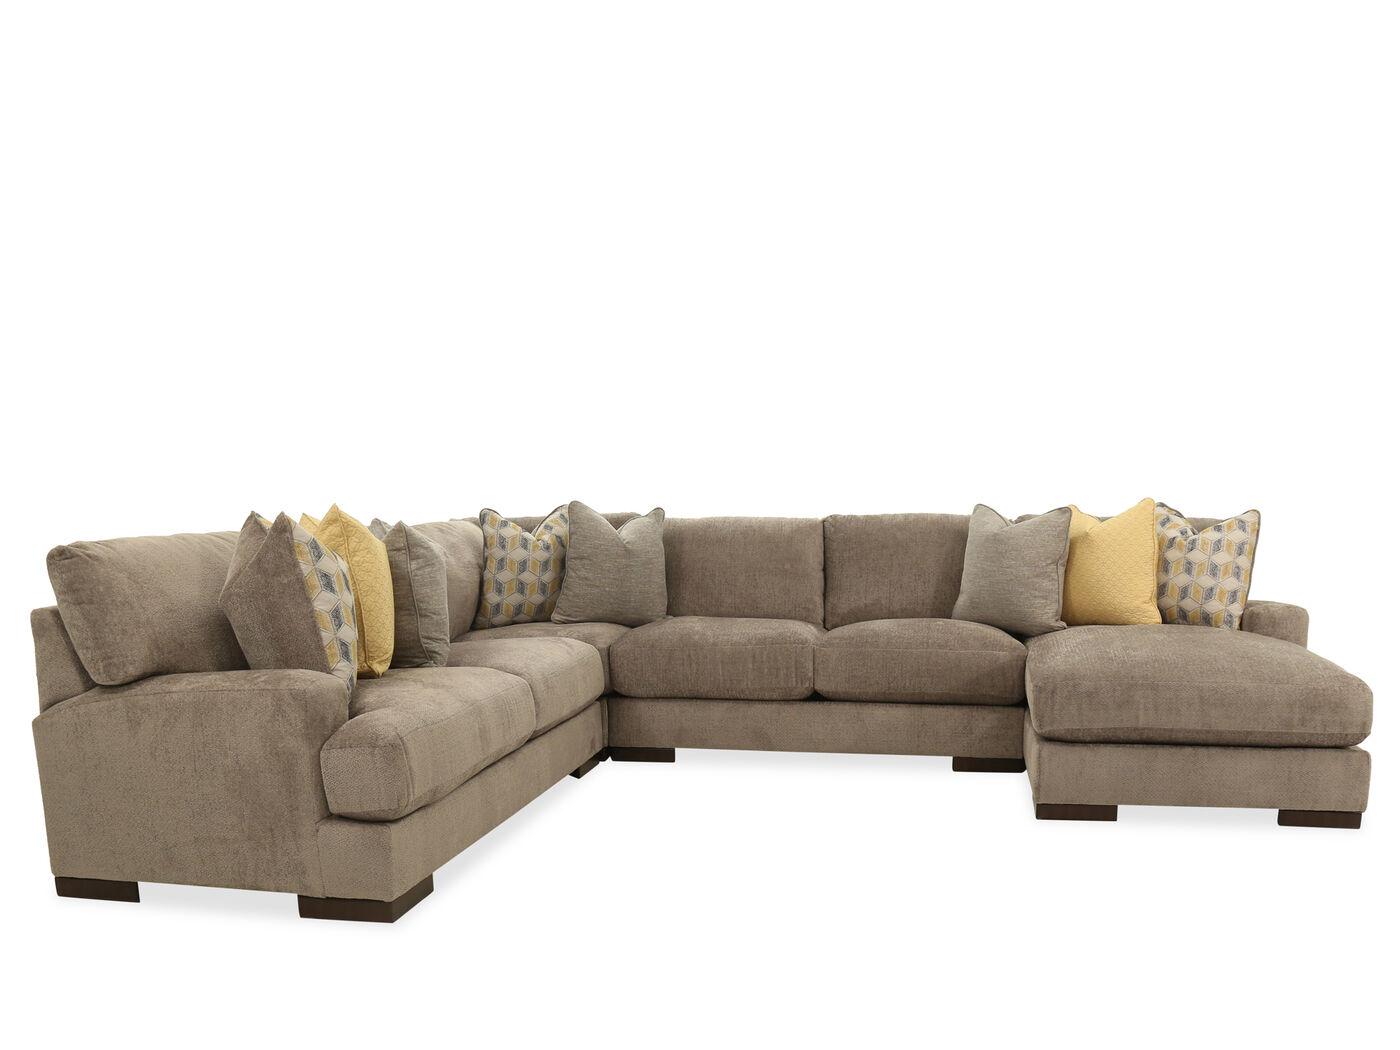 Ashley Fallsworth Brown 3 Piece Sectional Sofa